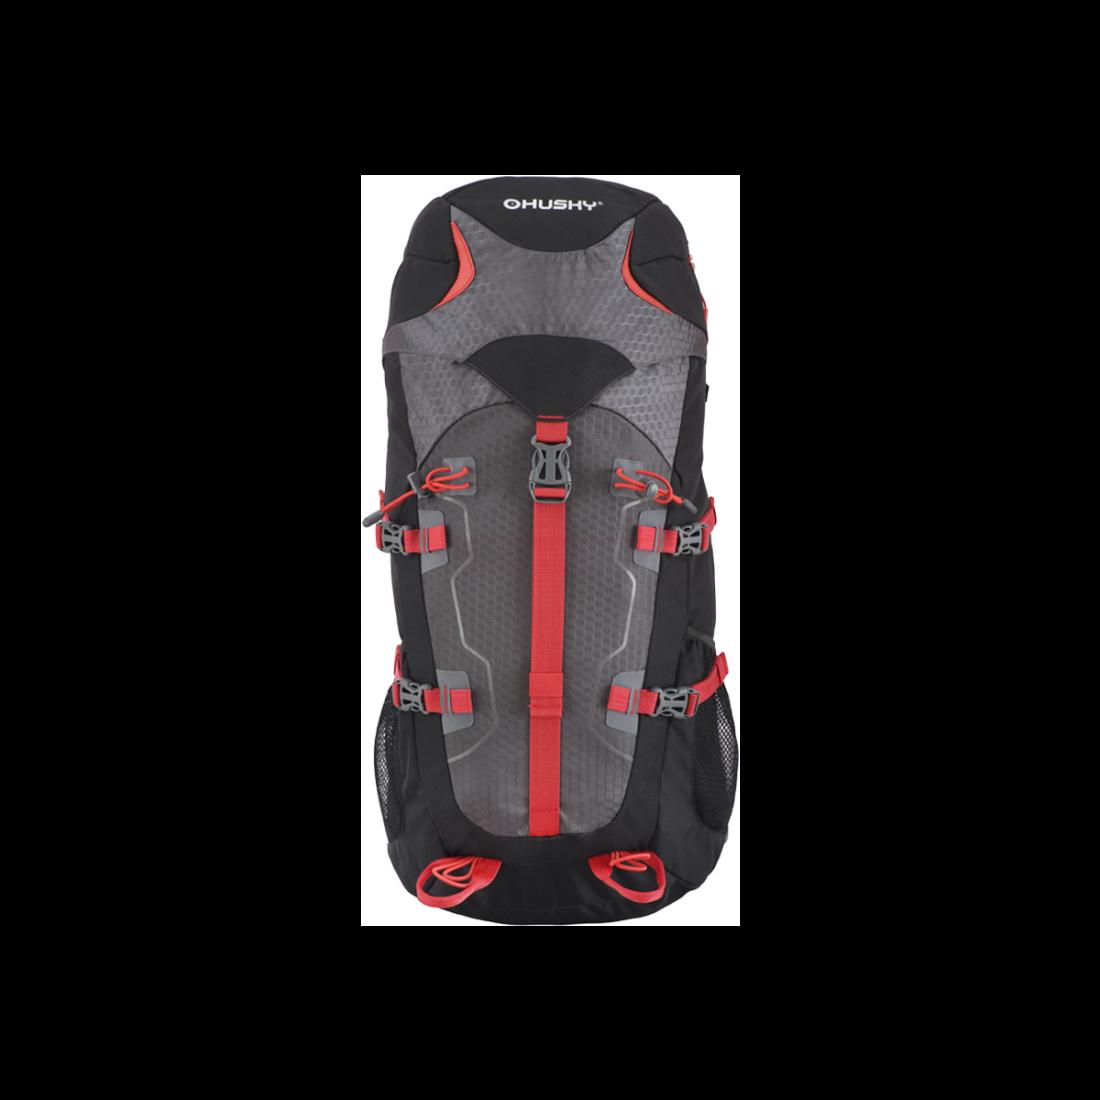 0dfcb806f2 Husky Scape 38l turistický batoh